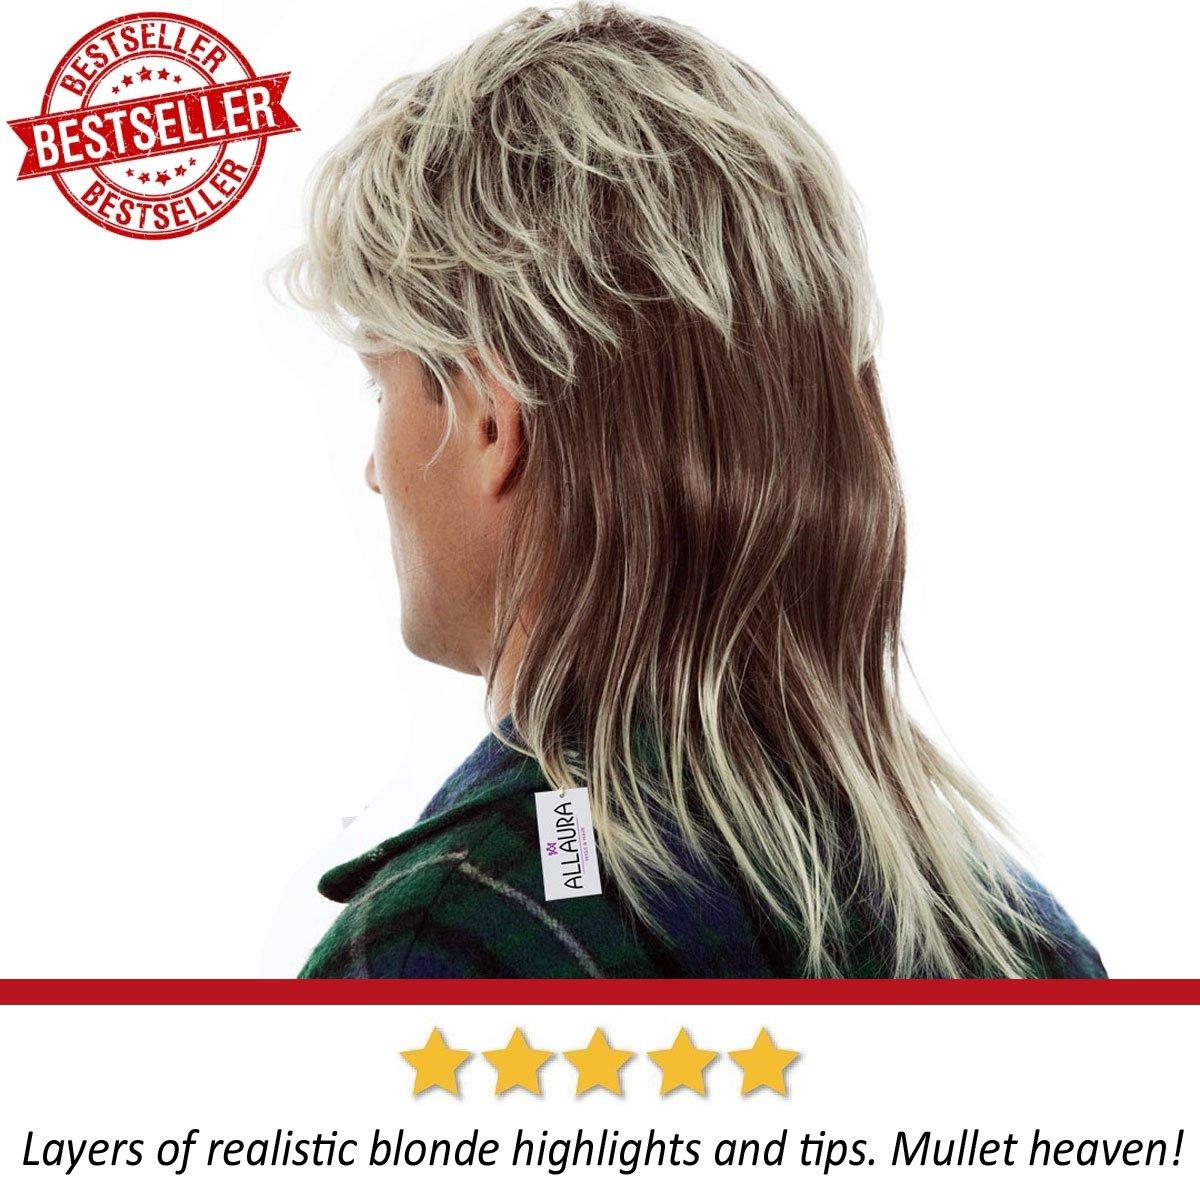 80s Blonde Mullet Wig for Men - Joe Dirt Wigs White Trash Redneck Costume by ALLAURA (Image #4)